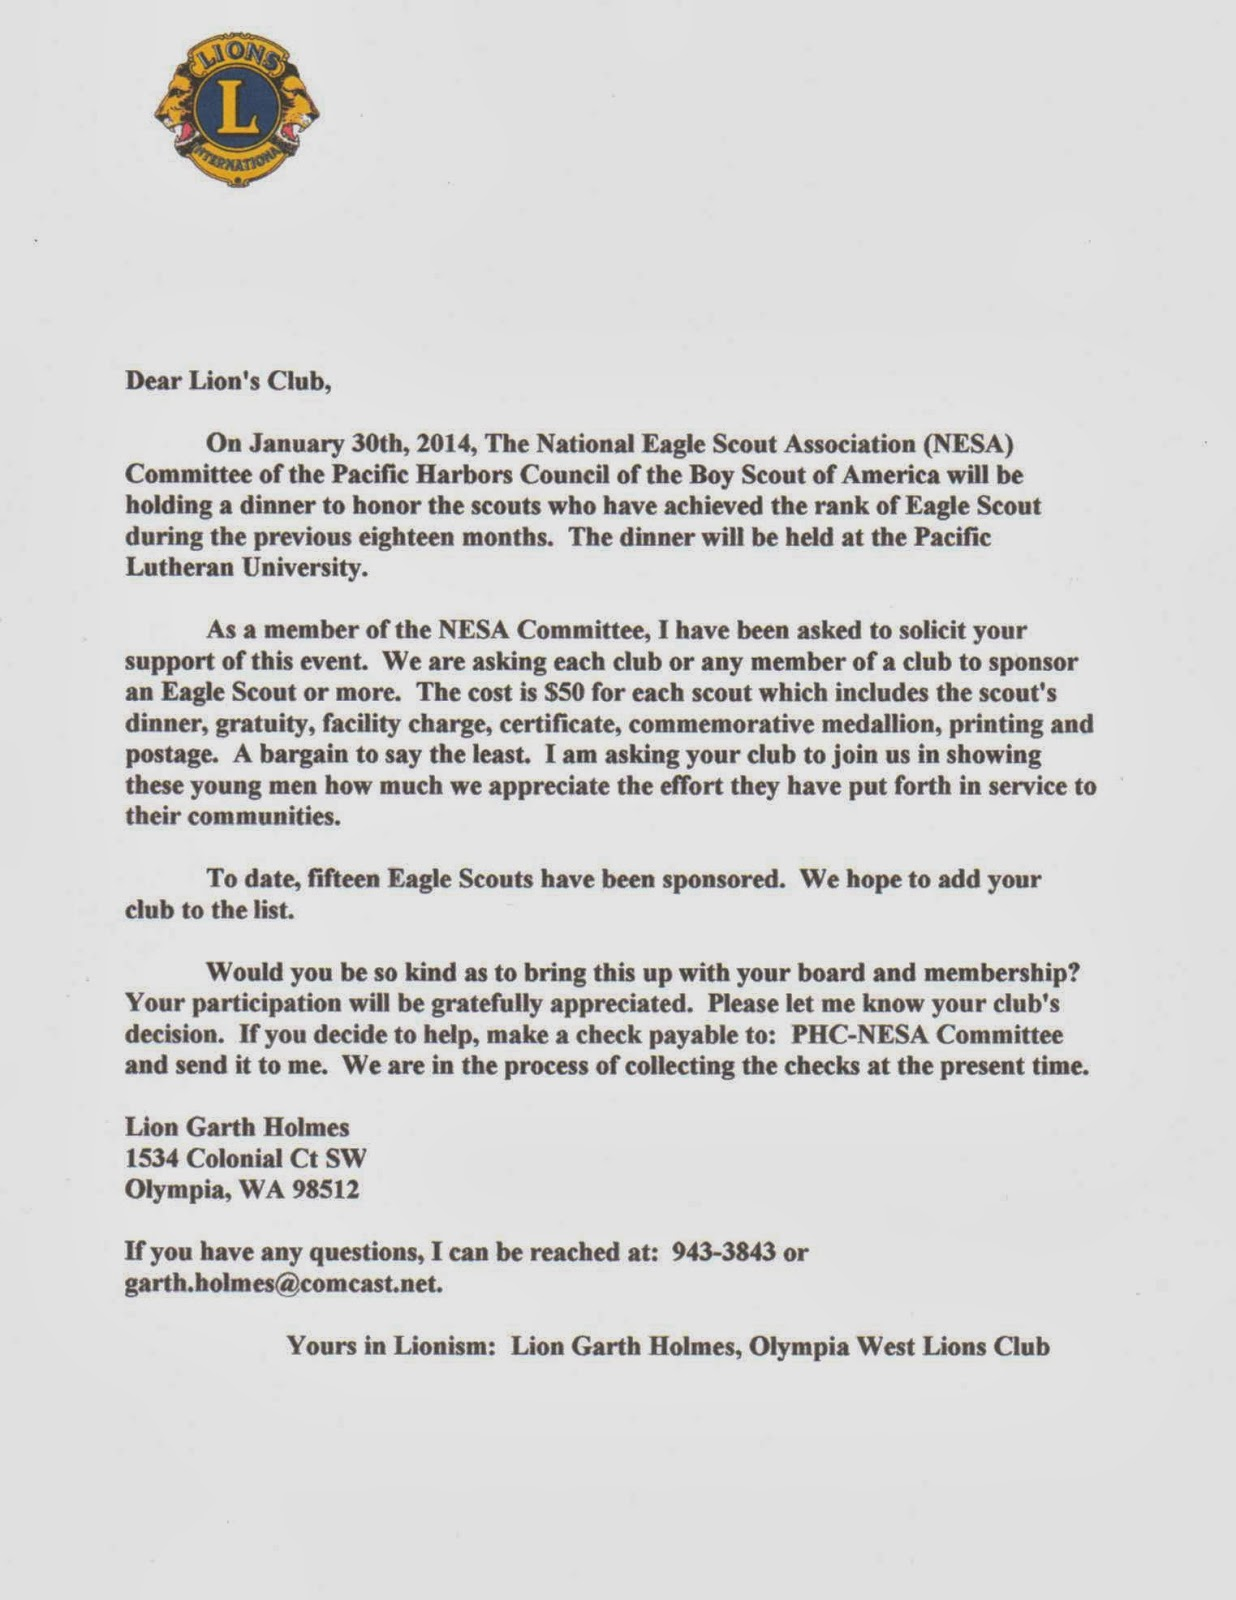 american legion letterhead template - boy scout scholarship essay